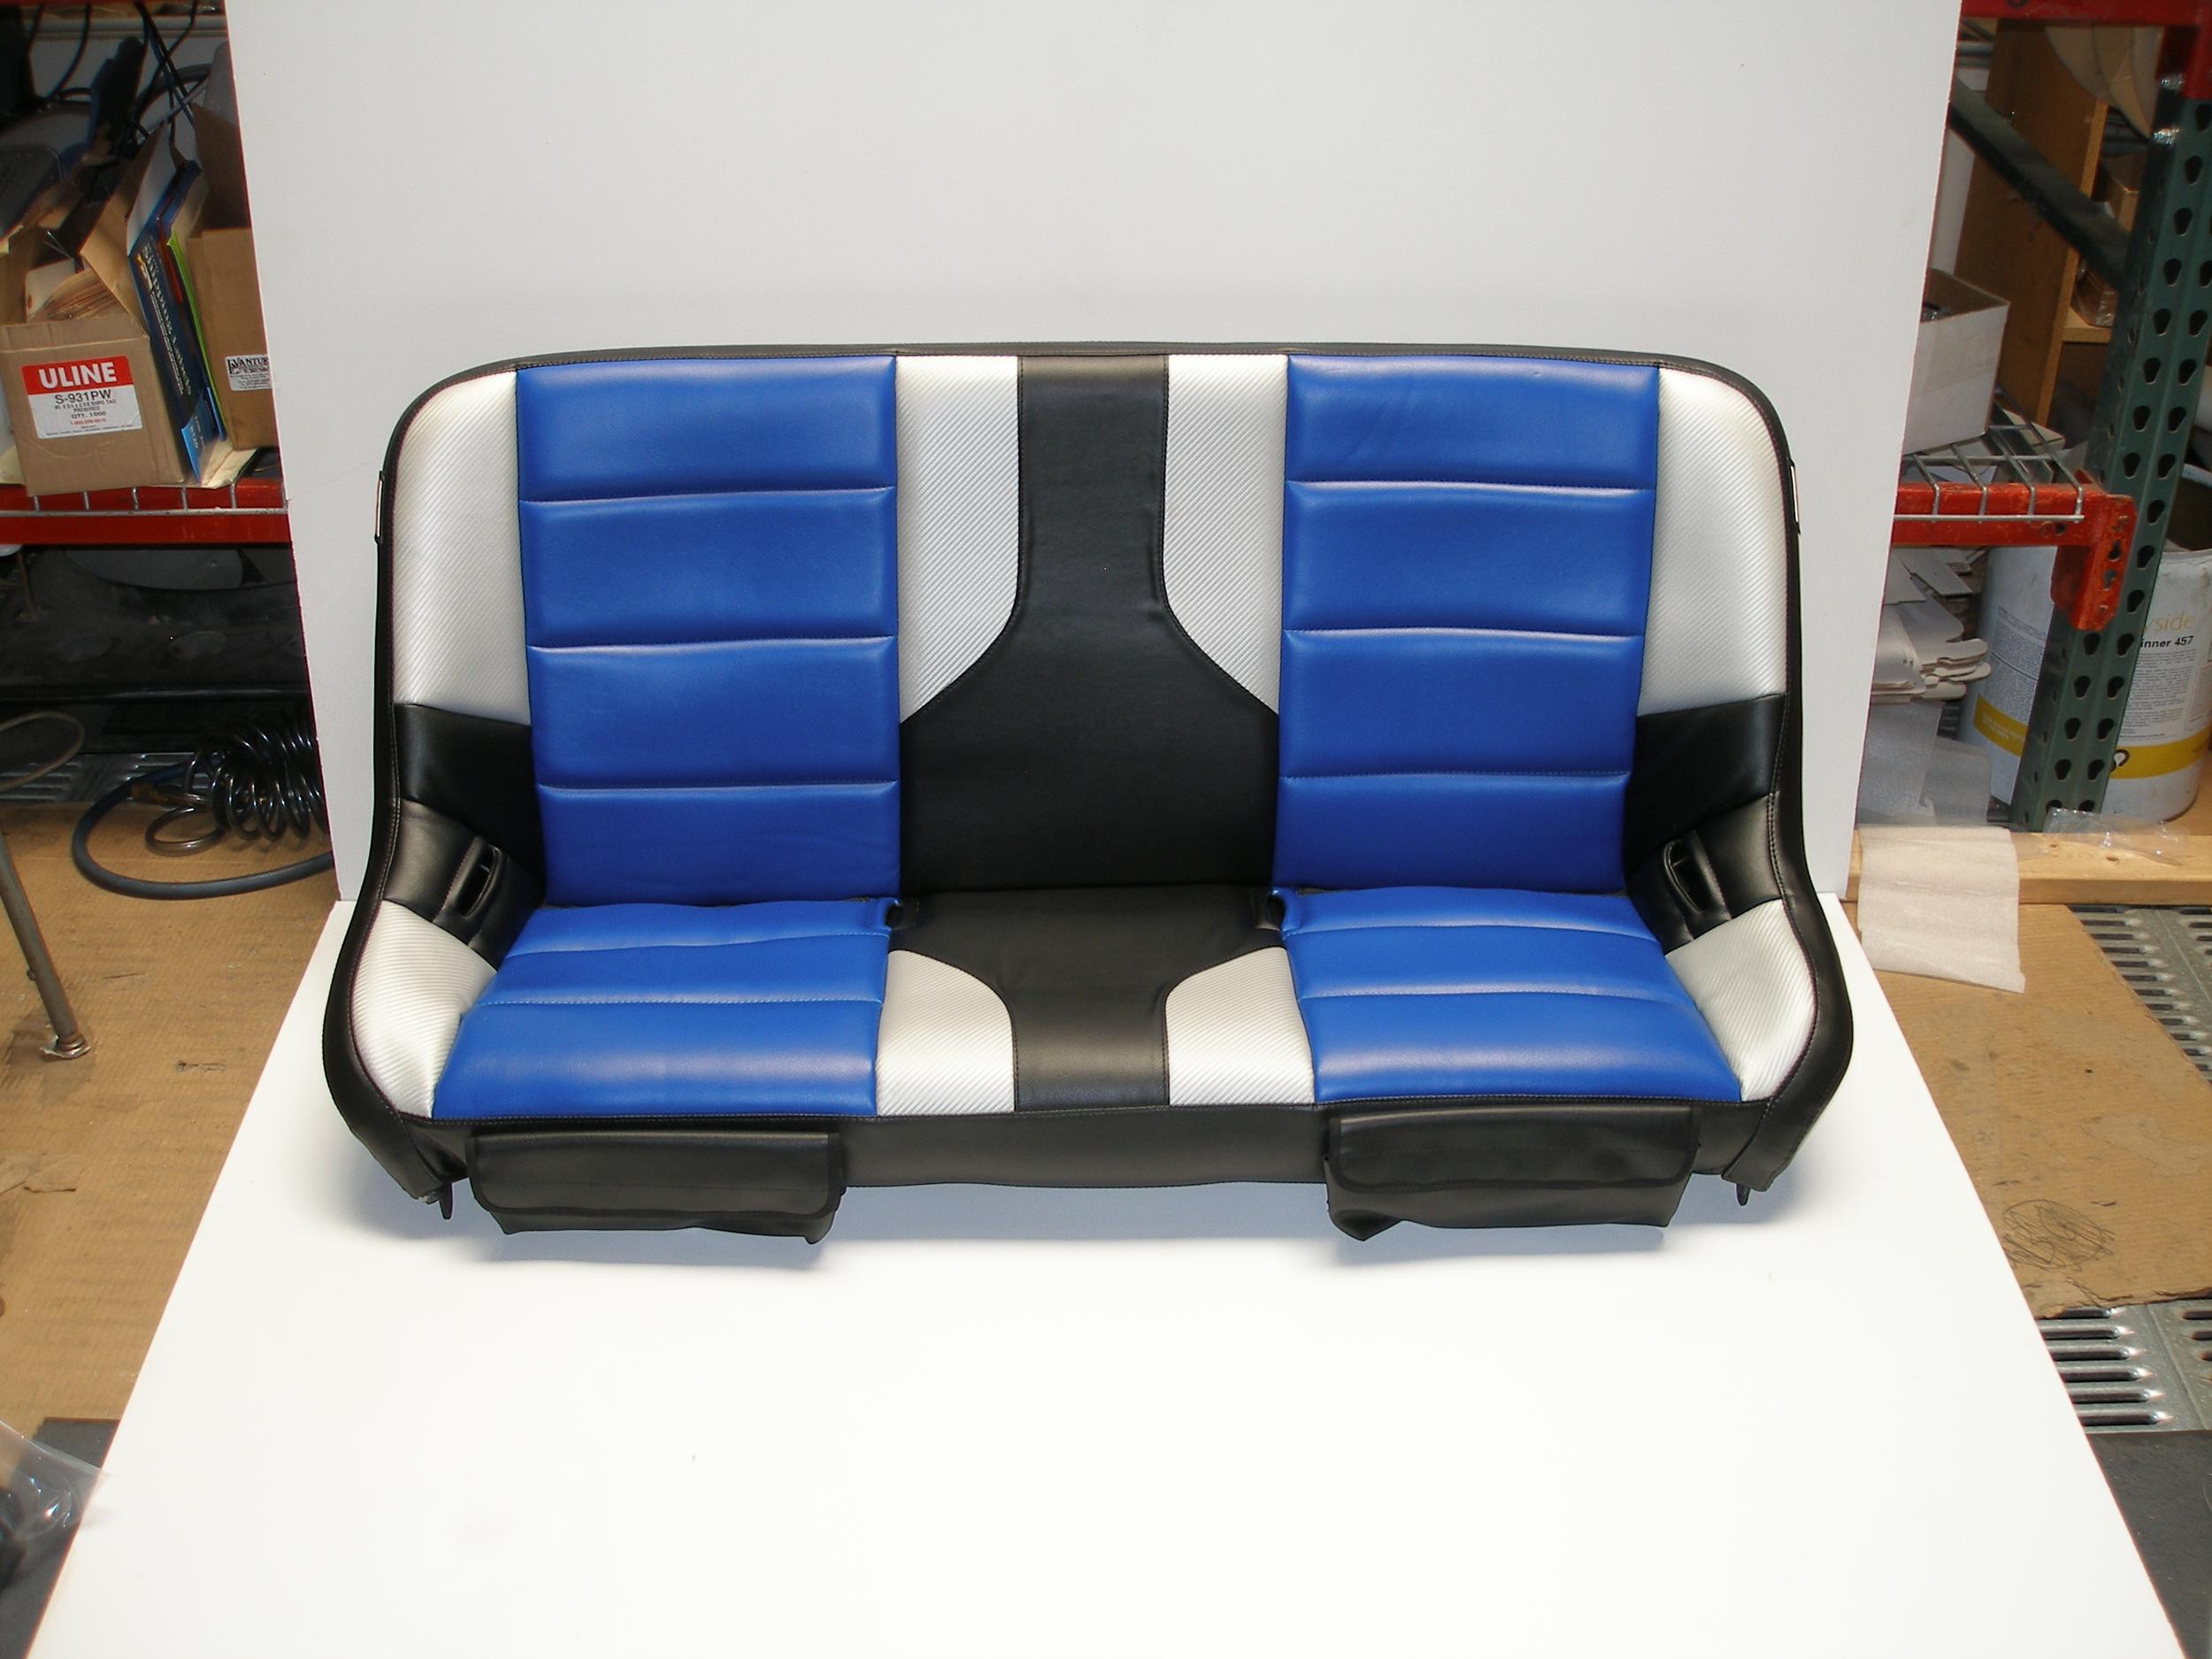 Super Sonic Blue Ralley Seat (1).JPG